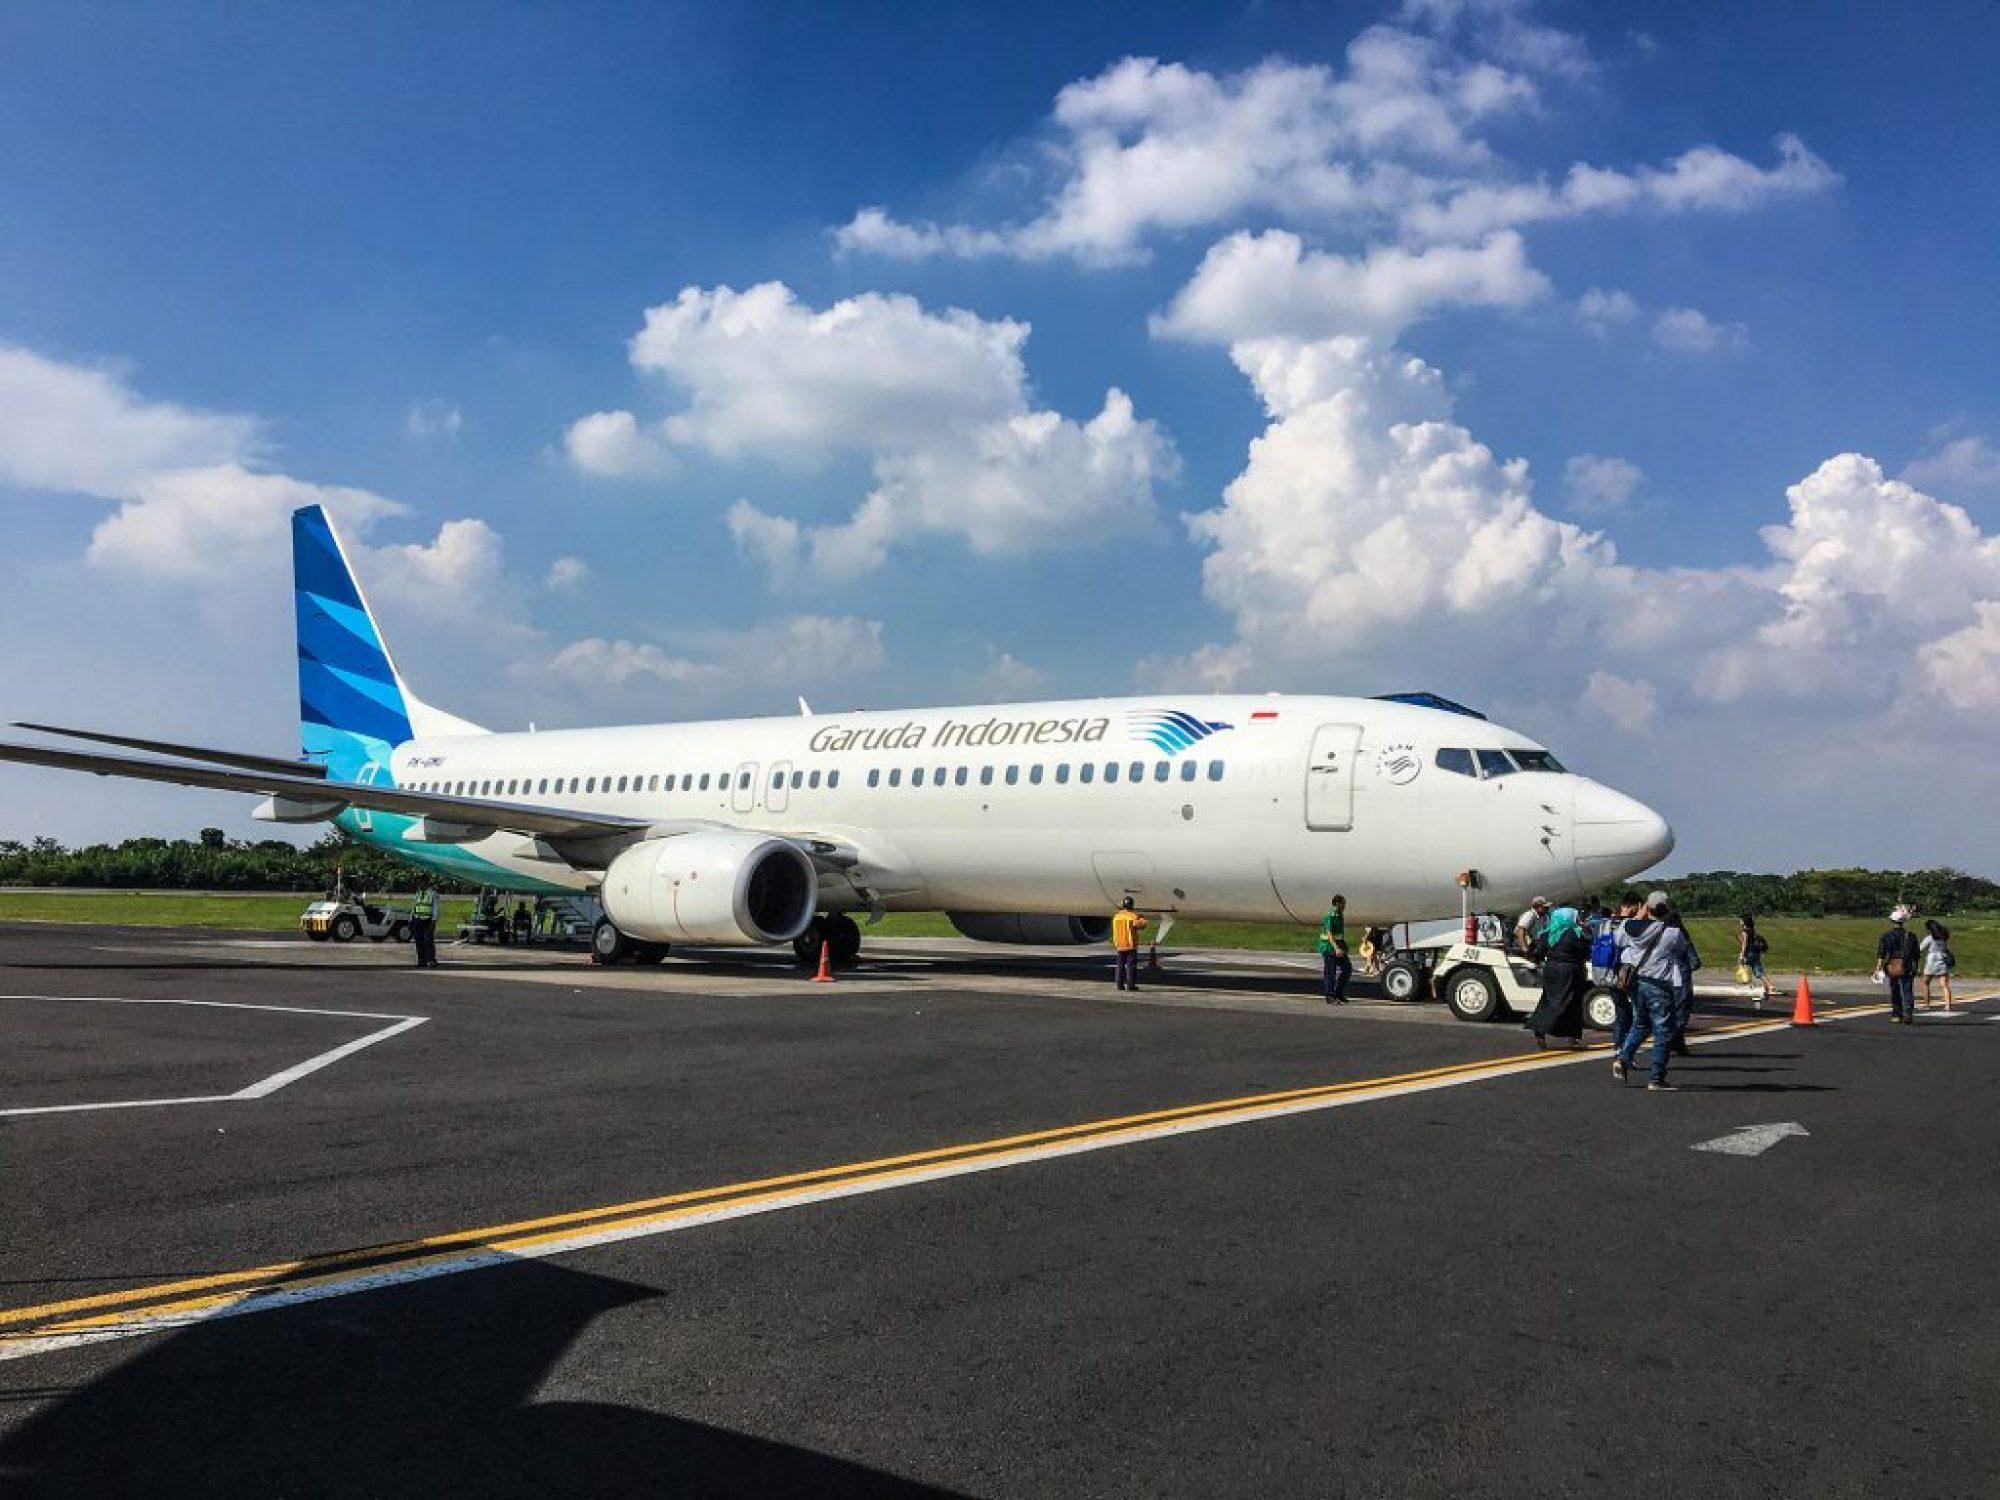 Preparativos de viaje a Indonesia-13